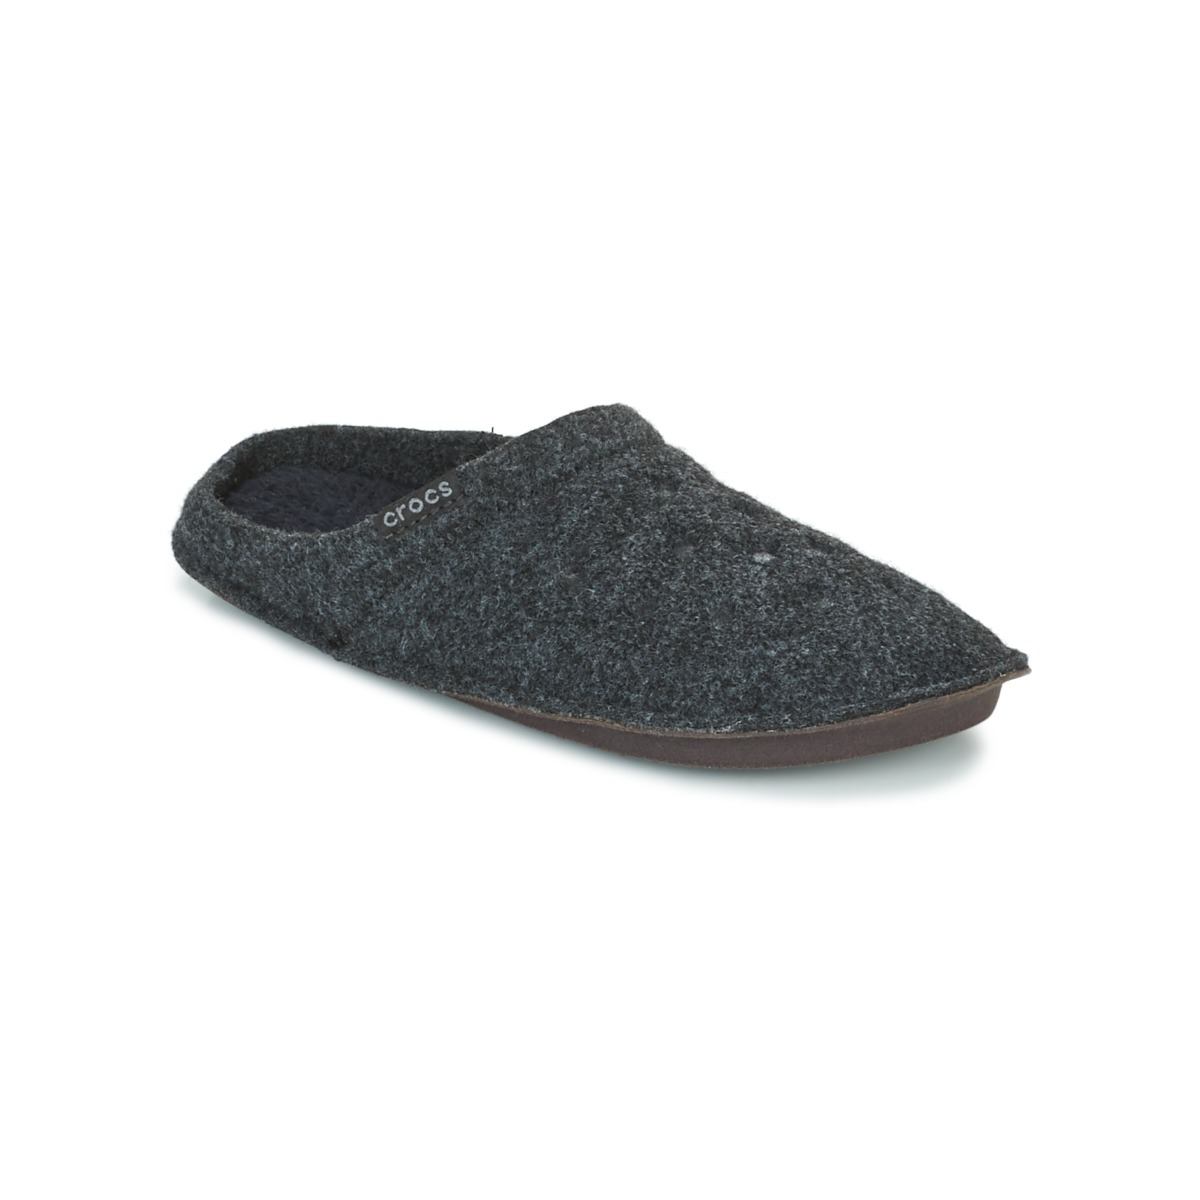 714e9b12715 Παντόφλες Crocs CLASSIC SLIPPER, ΓΥΝΑΙΚΑ | ΠΑΠΟΥΤΣΙΑ | ΠΑΝΤΟΦΛΕΣ